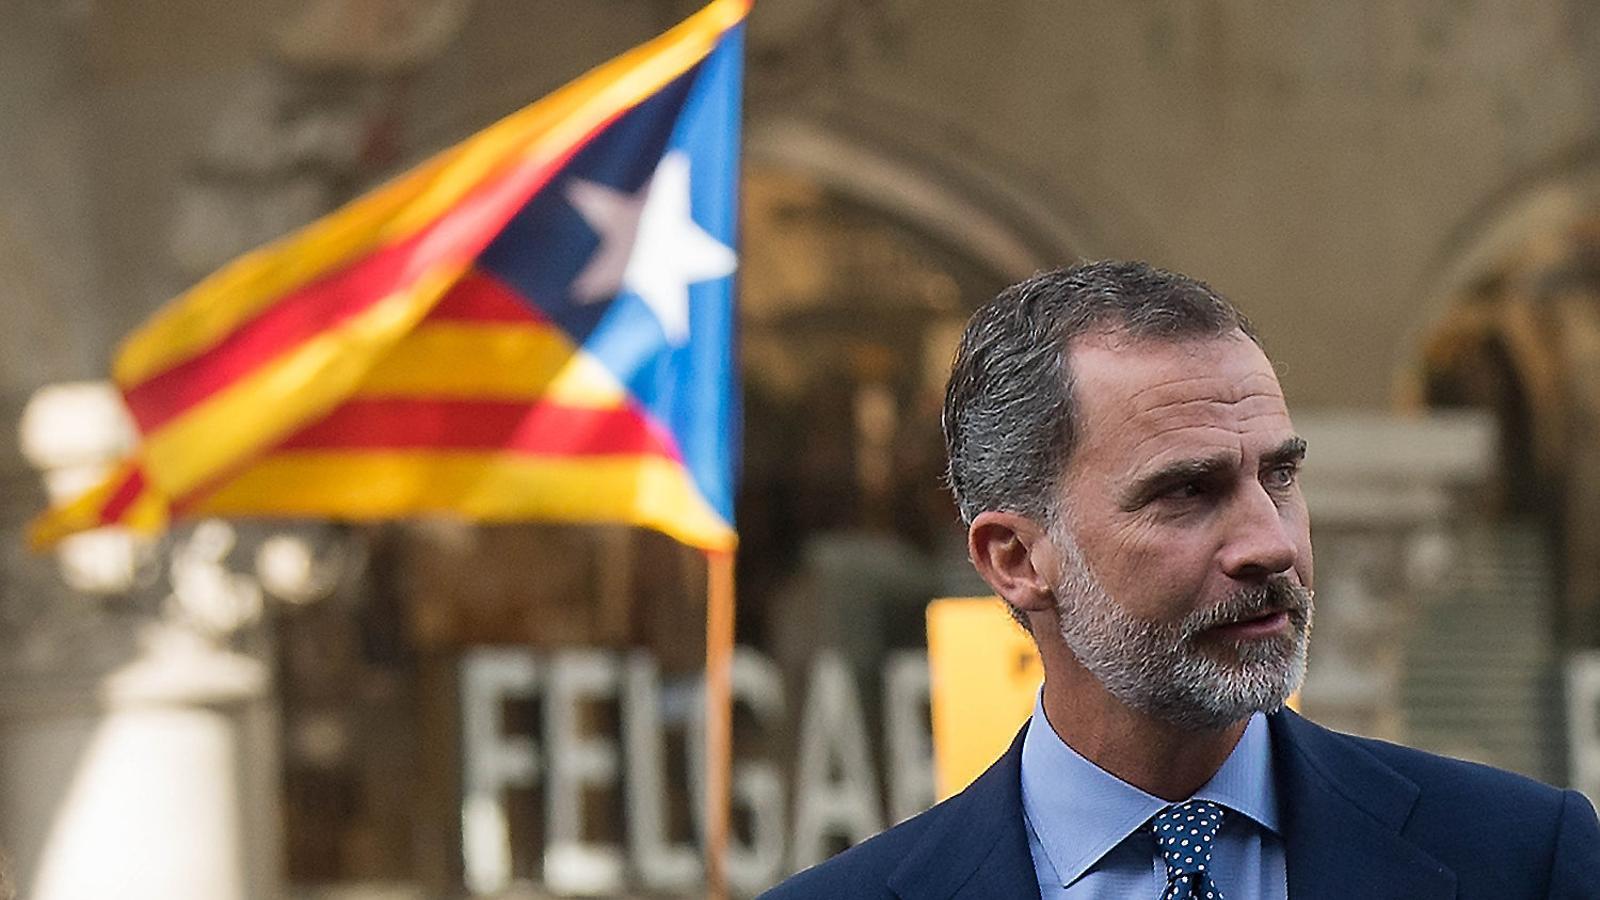 Felip-VI-visitara-Catalunya-primera_1962413936_51181169_1500x1000